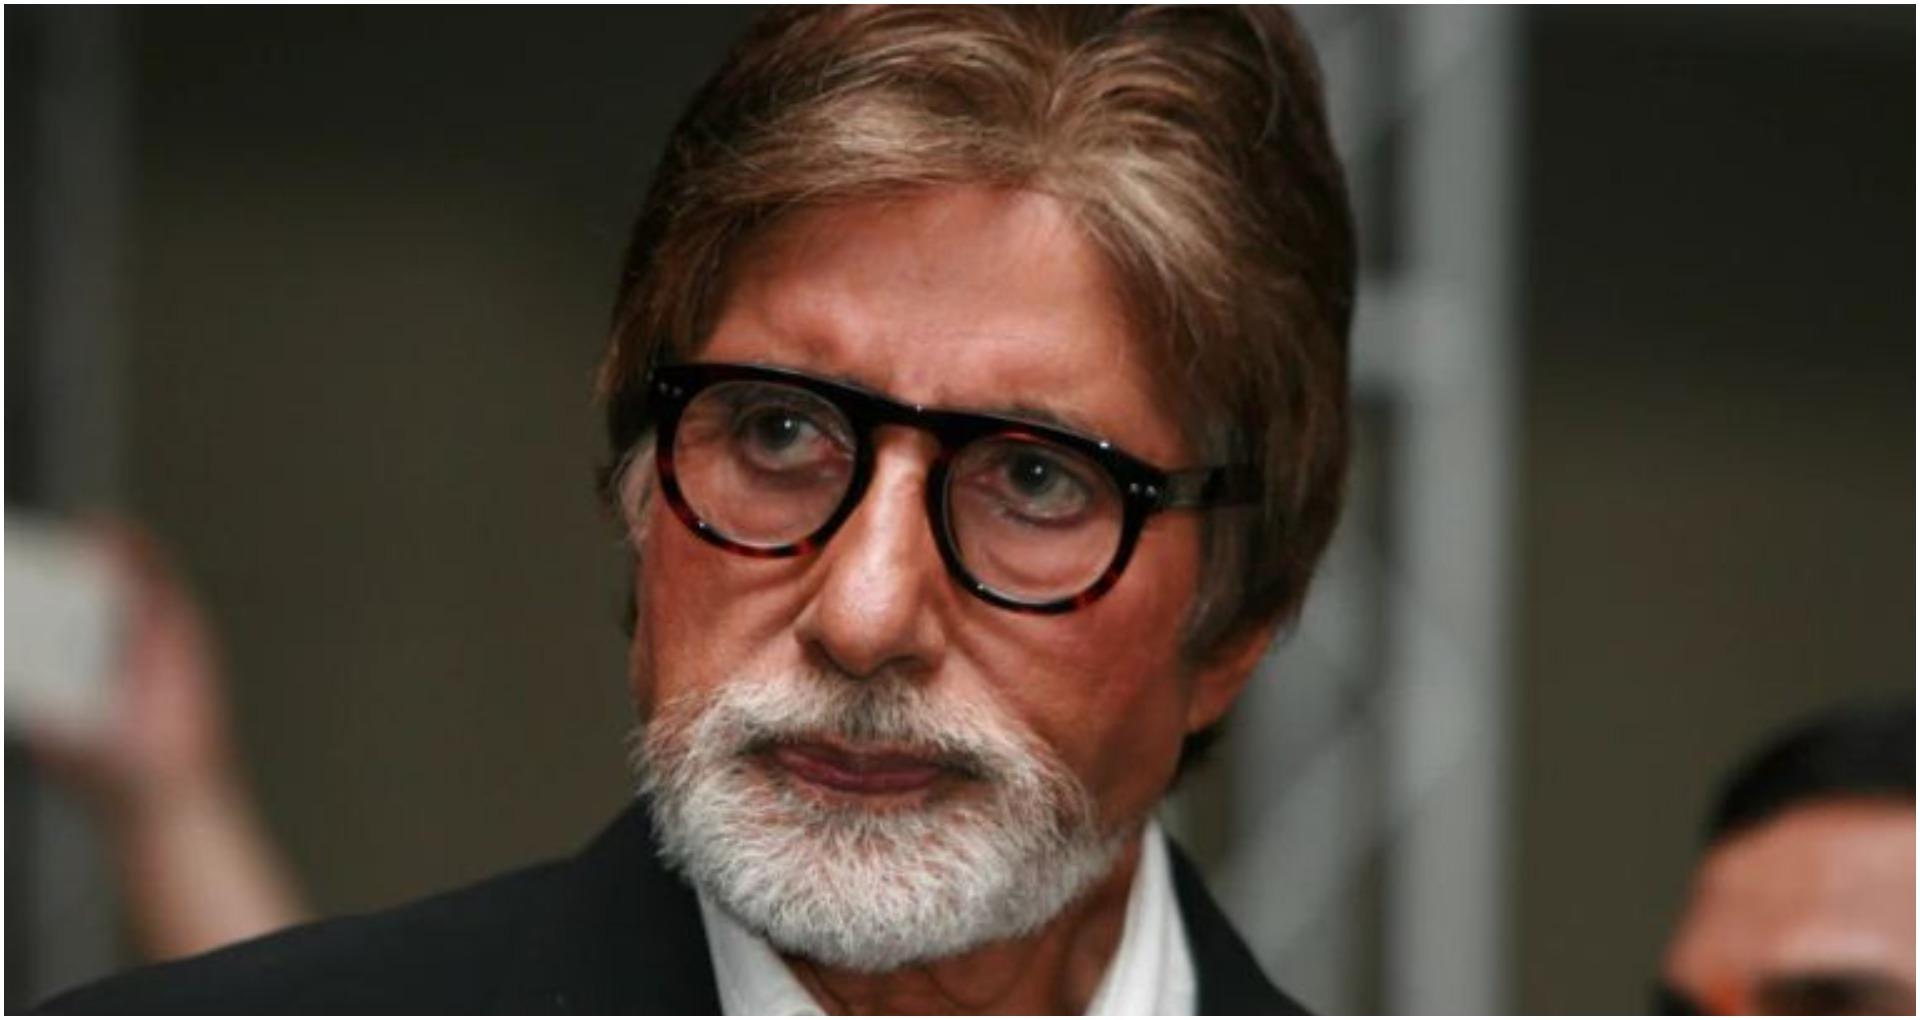 नानावती हॉस्पिटल ने जारी किया हेल्थ अपडेट: अमिताभ बच्चन की सेहत को लेकर कही ये जरूरी बात